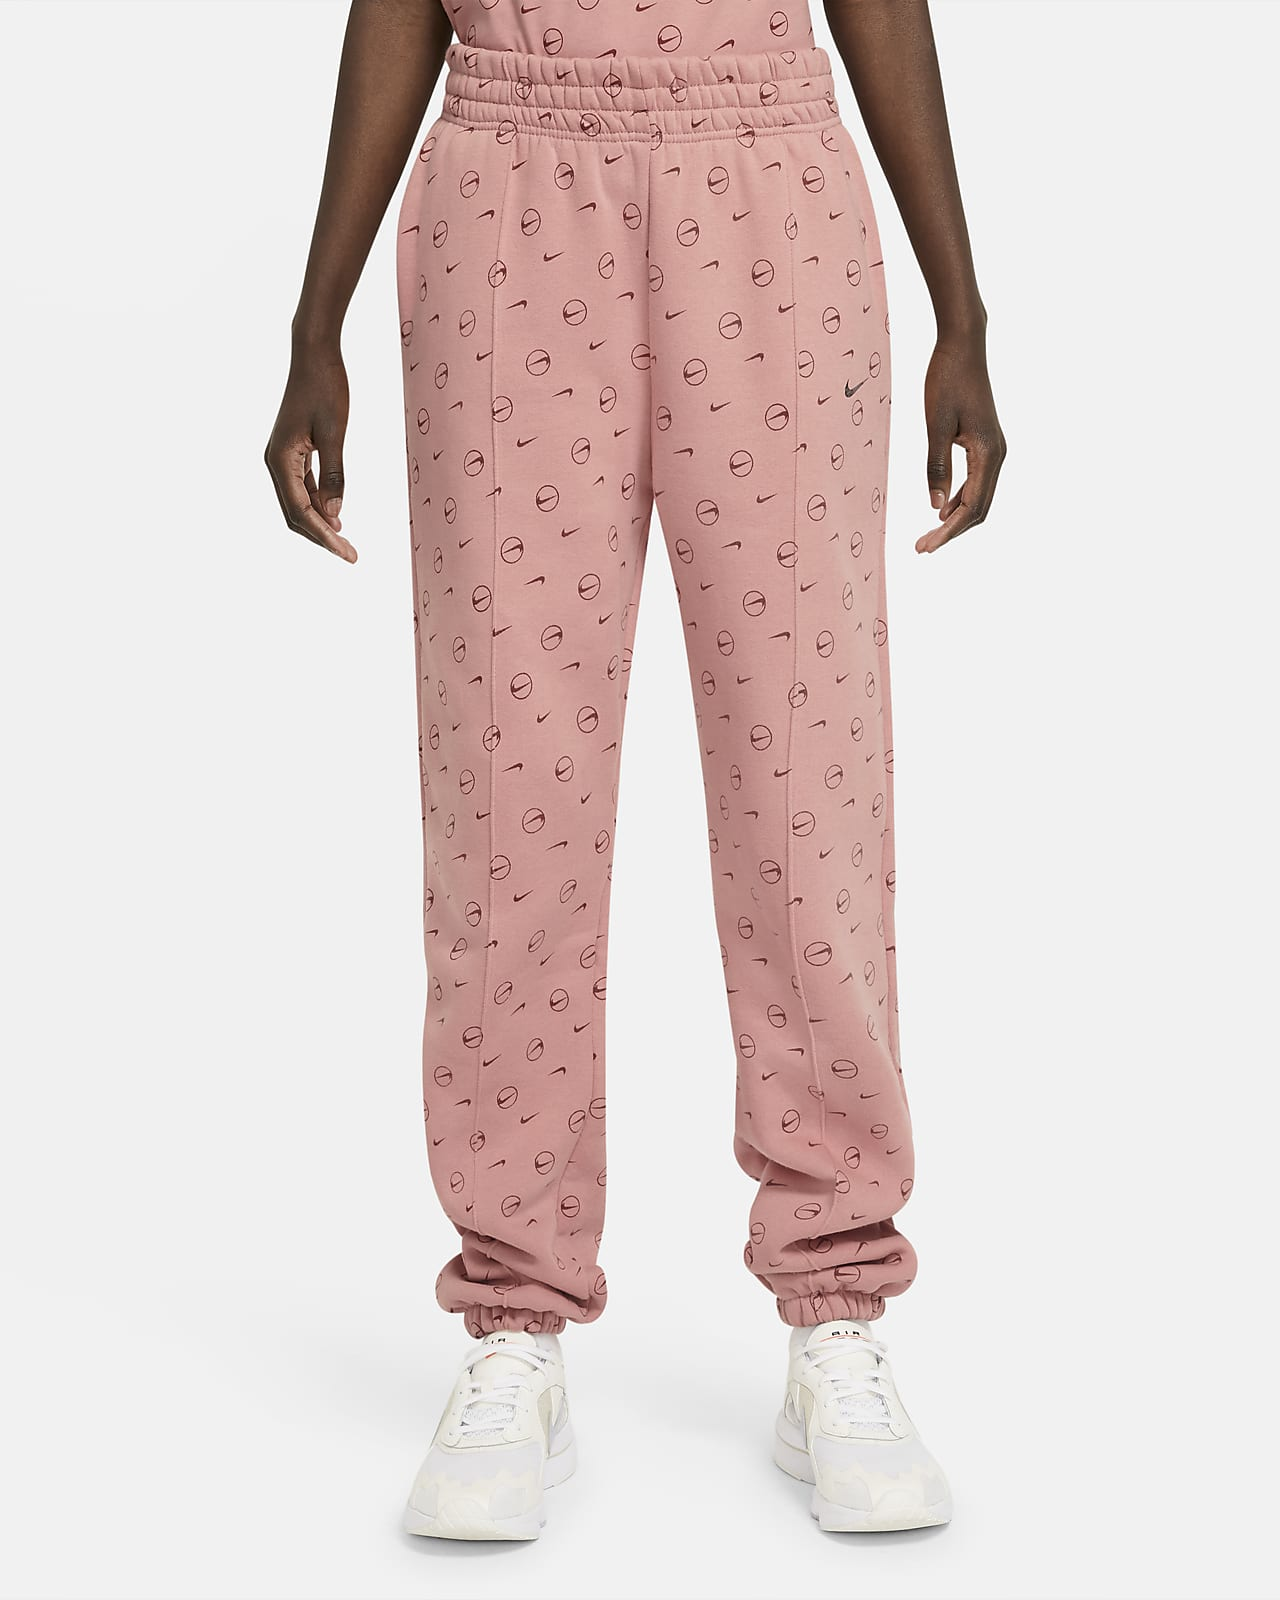 Женские брюки с принтом Nike Sportswear